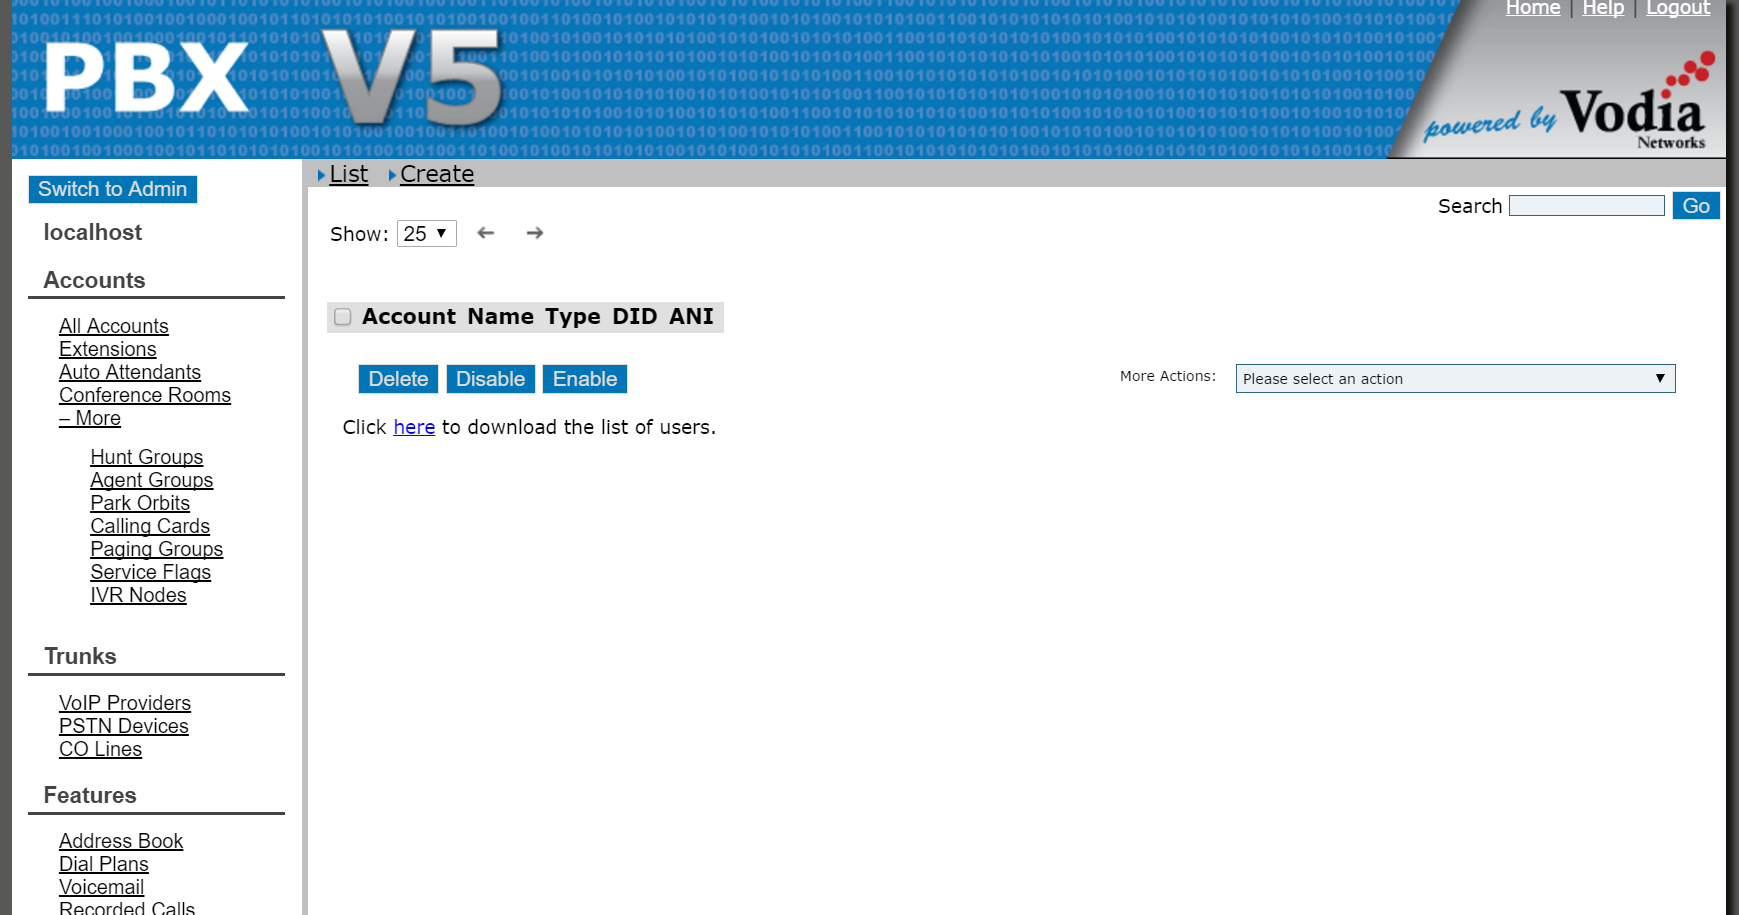 Vodia PBX Software - Create user lists